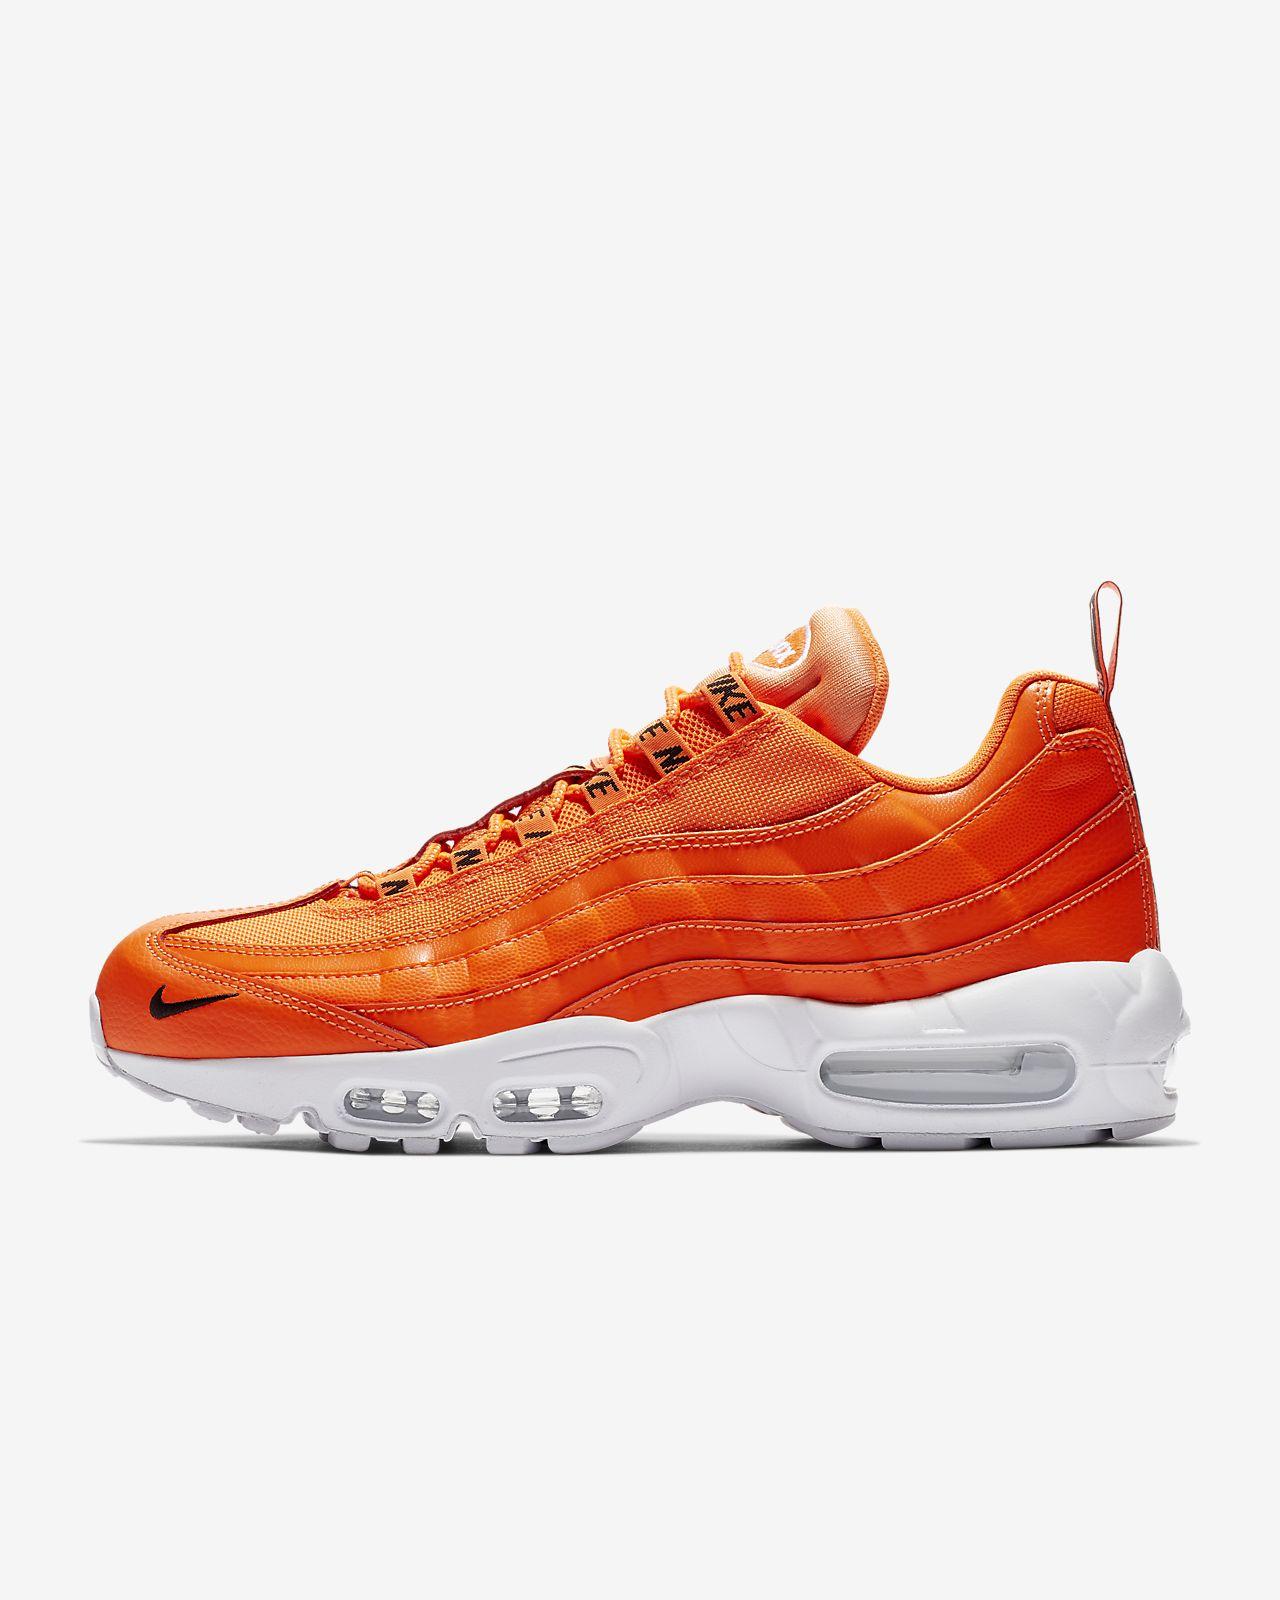 brand new 1f30b 04145 ... Nike Air Max 95 Premium – sko til mænd